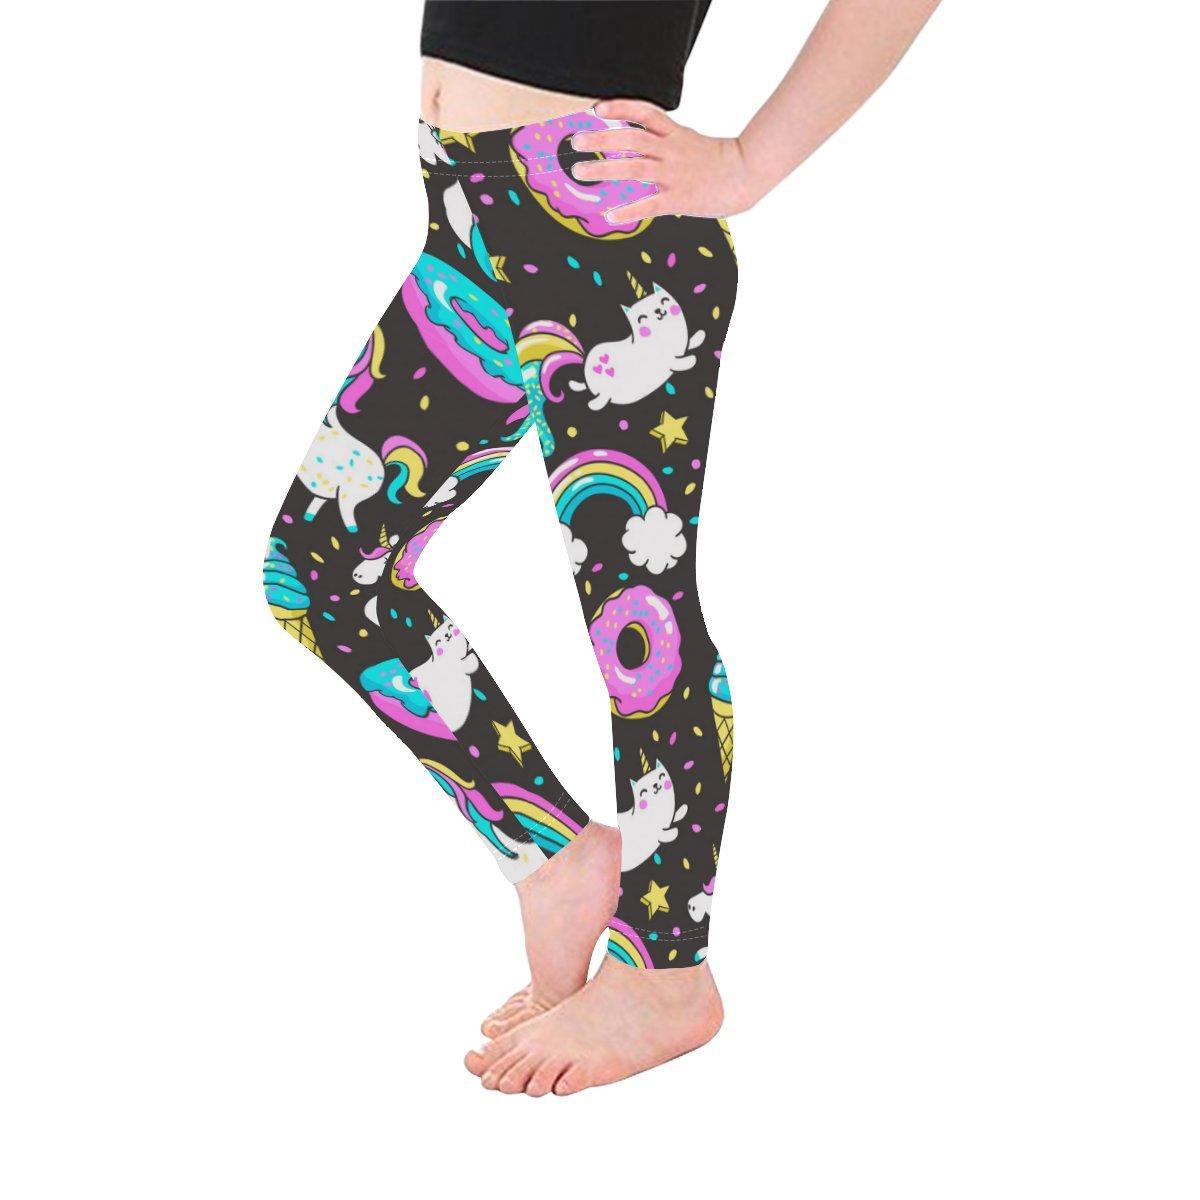 Artsadd Unique Debora Custom Kids Ankle Length Leggings Skinny Pants